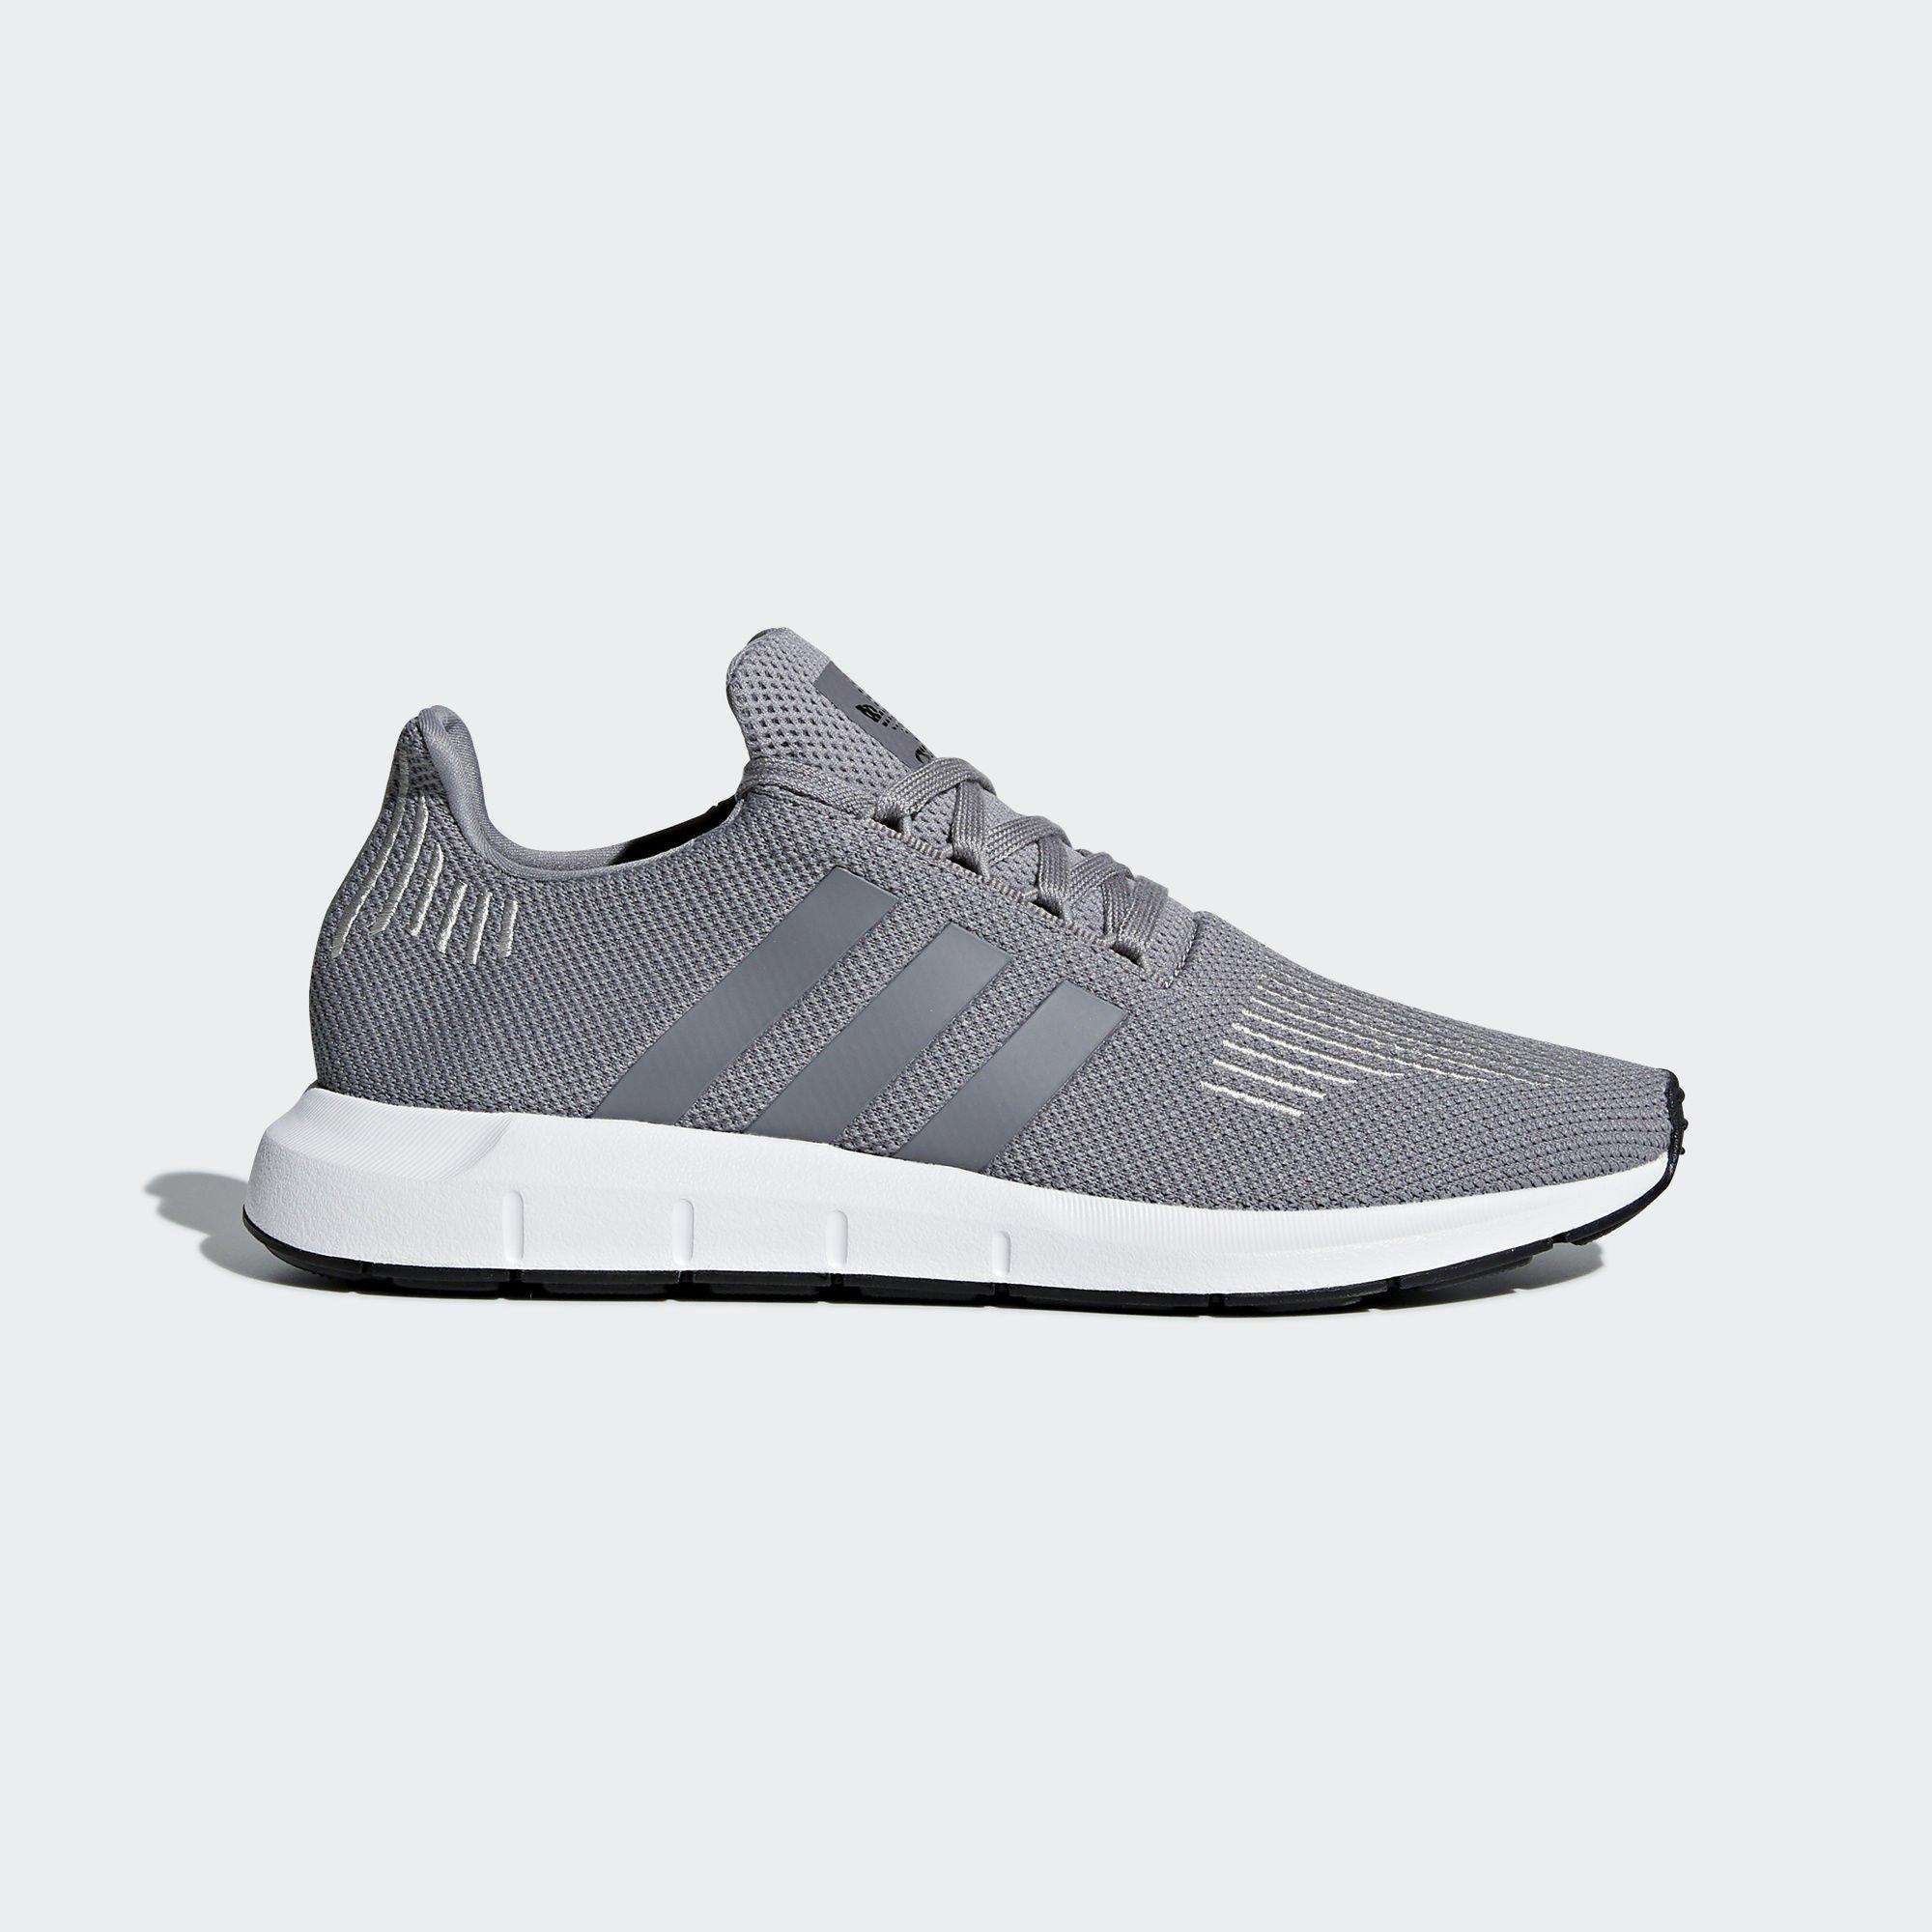 Galleon - Adidas Men s Swift Run Shoes ab1f0db04